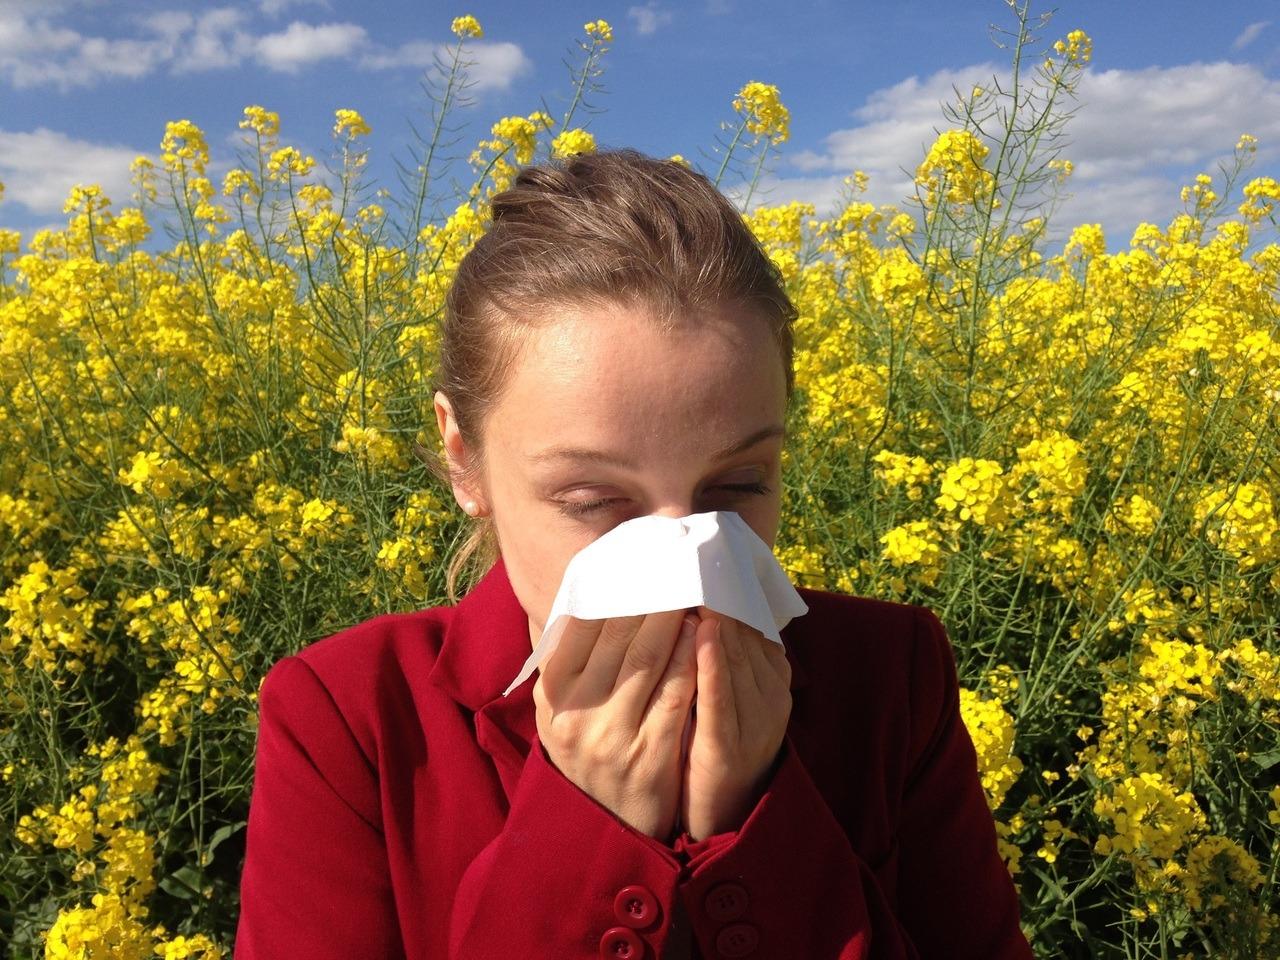 Soigner son rhume des foins avec Desloratadine (ordonnance en ligne possible)